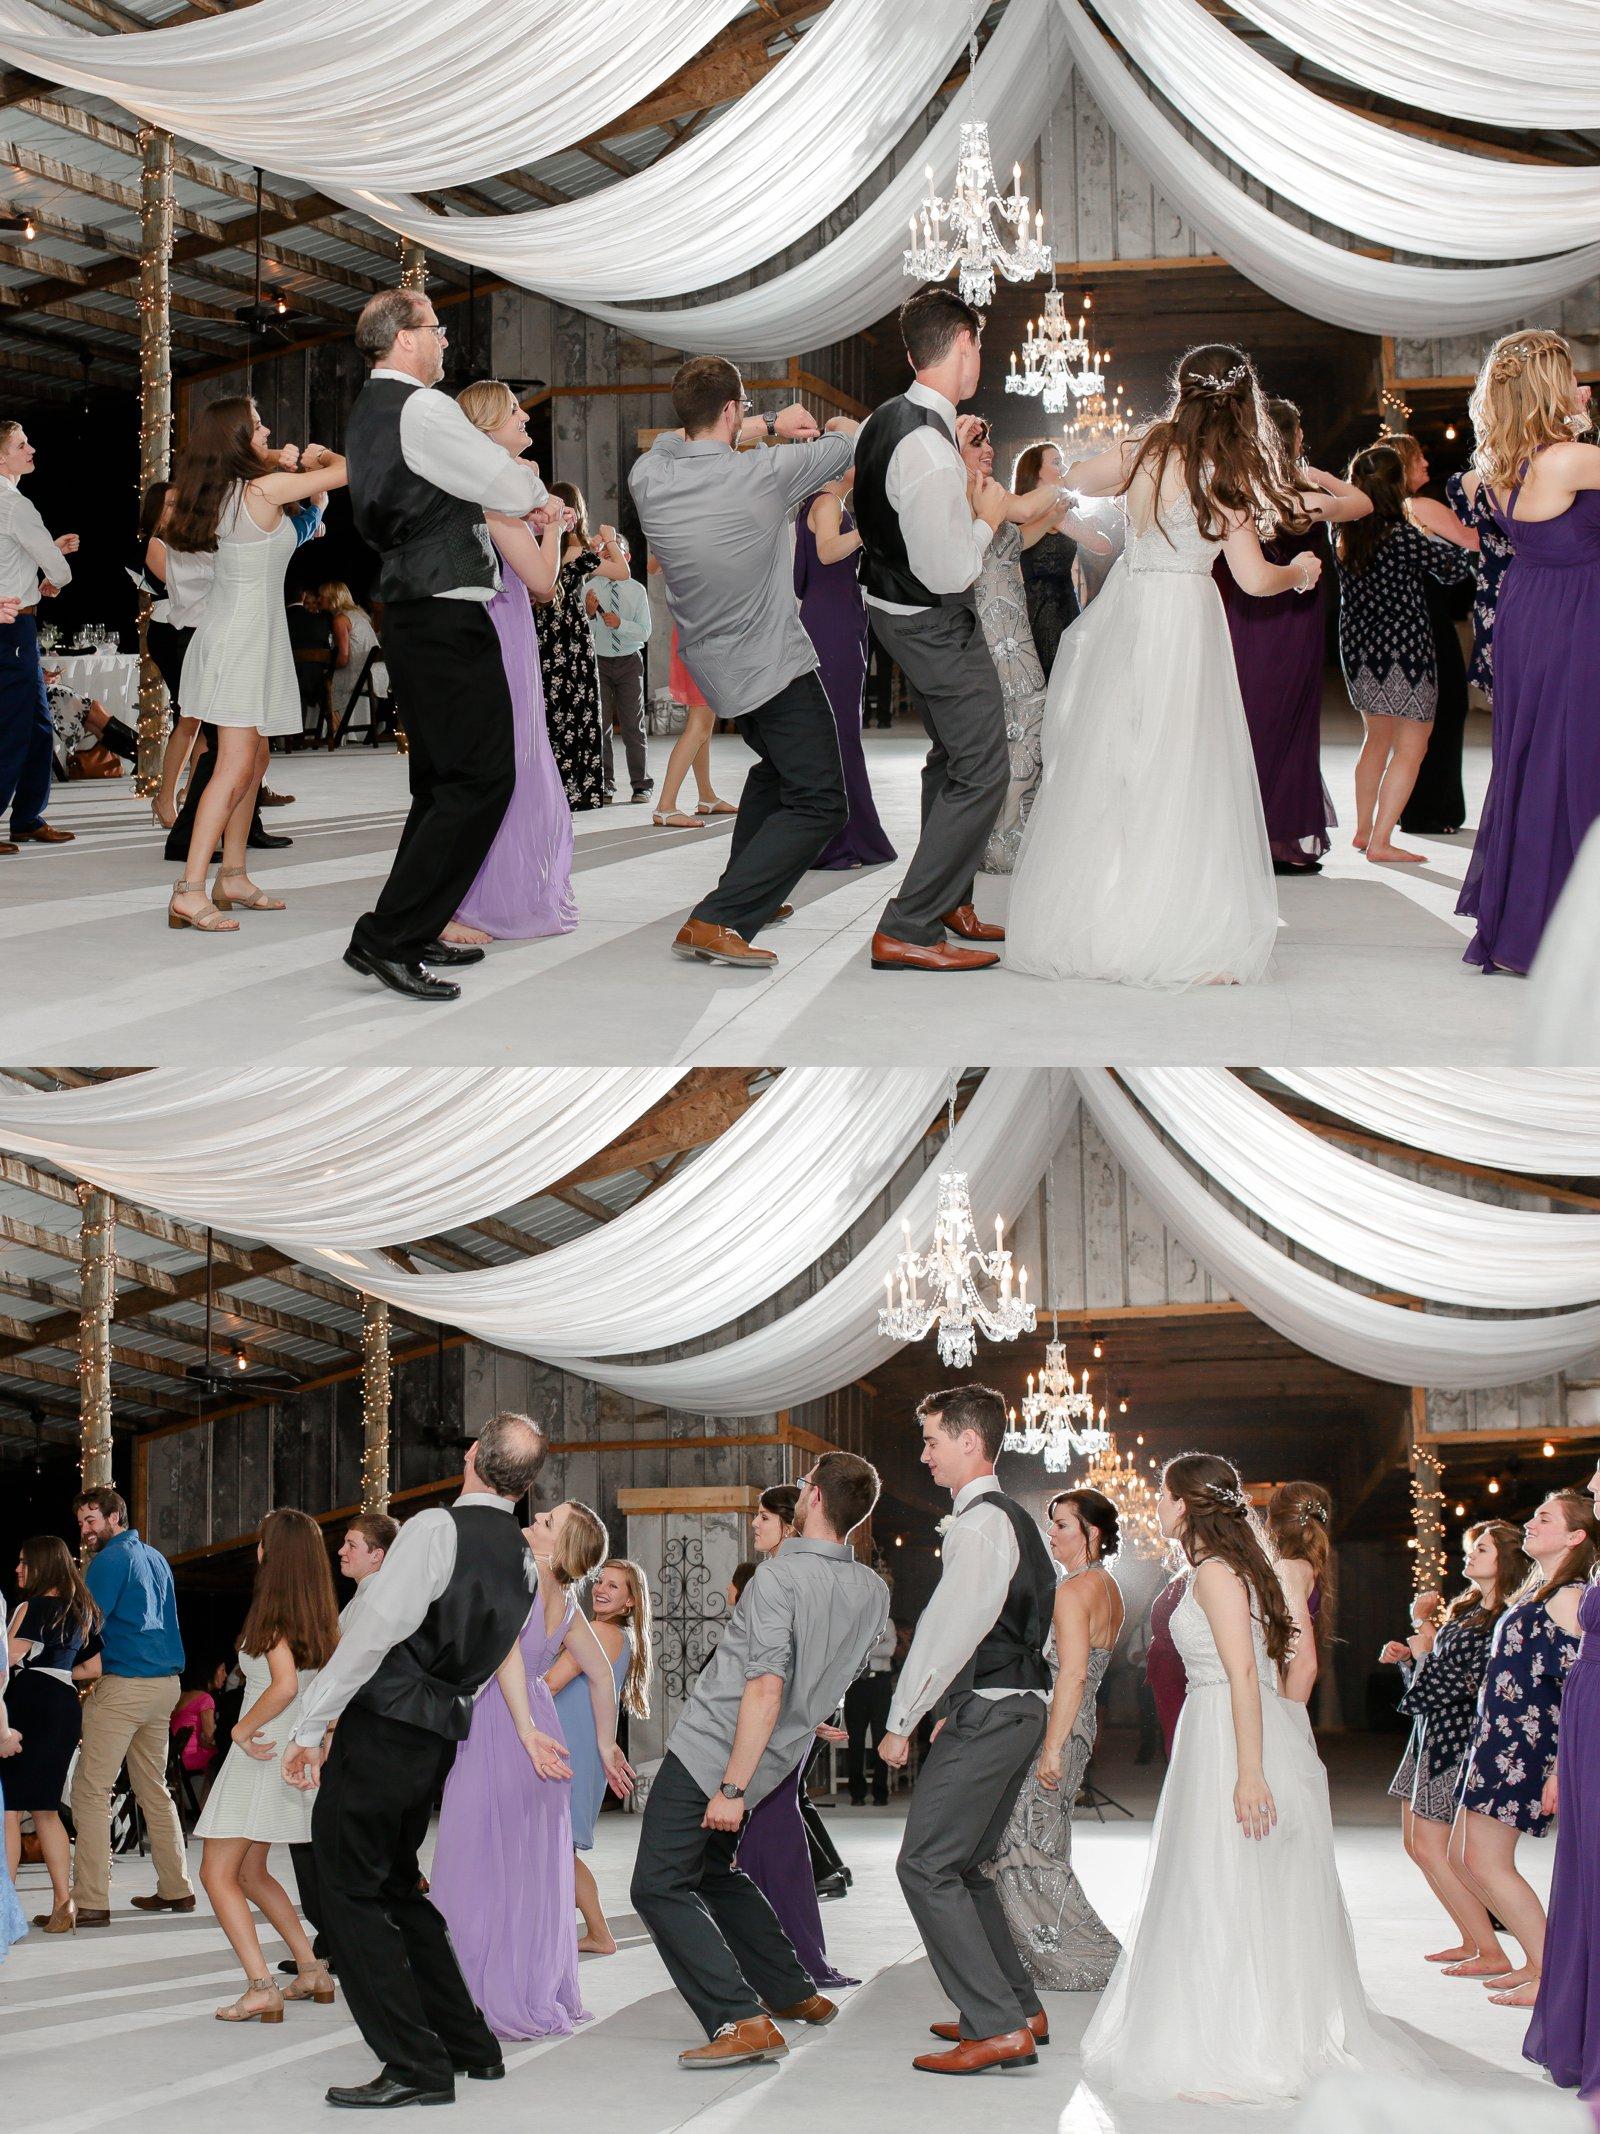 wedding_photographer_Missouri_Destination_elope_intimate_Saint_James_MO_Missouri_KansasCity_Jeff_City_Jefferson_Columbia_Engagement_Photos_Pictures_Session_Best_Videographer_0191.jpg